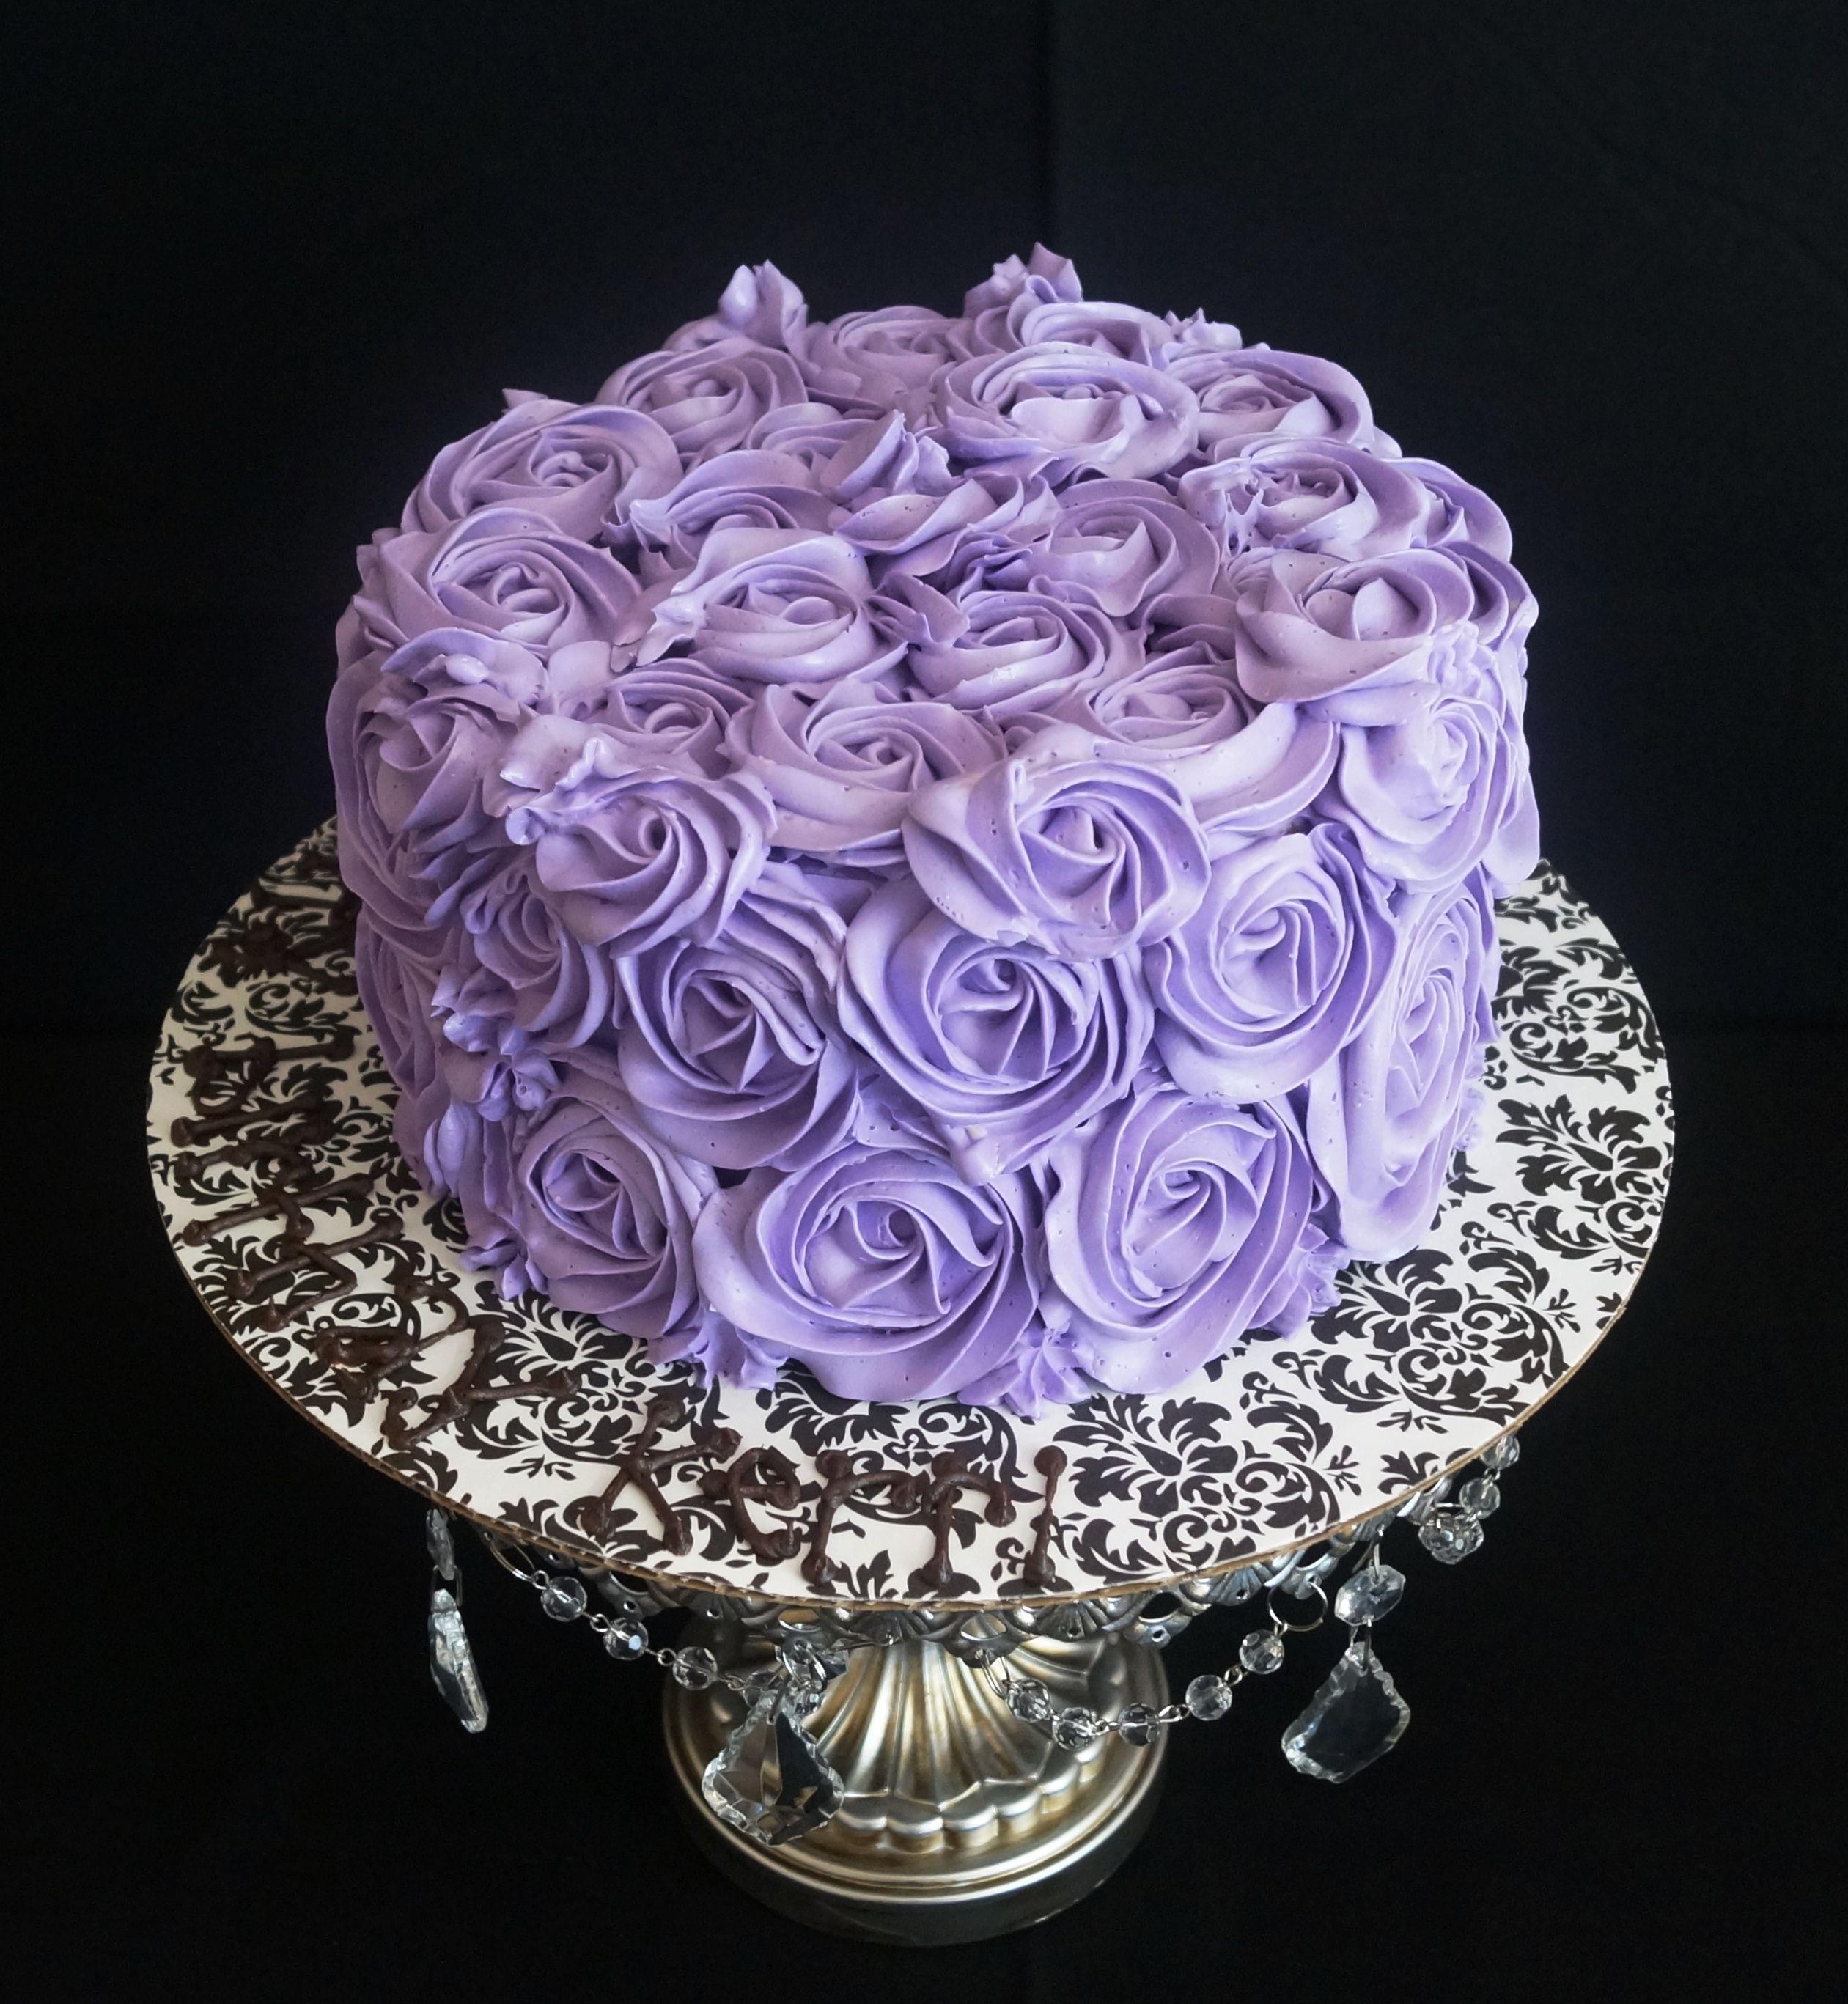 70th bd cake for mom nunna 80th ideas Pinterest Cake 70